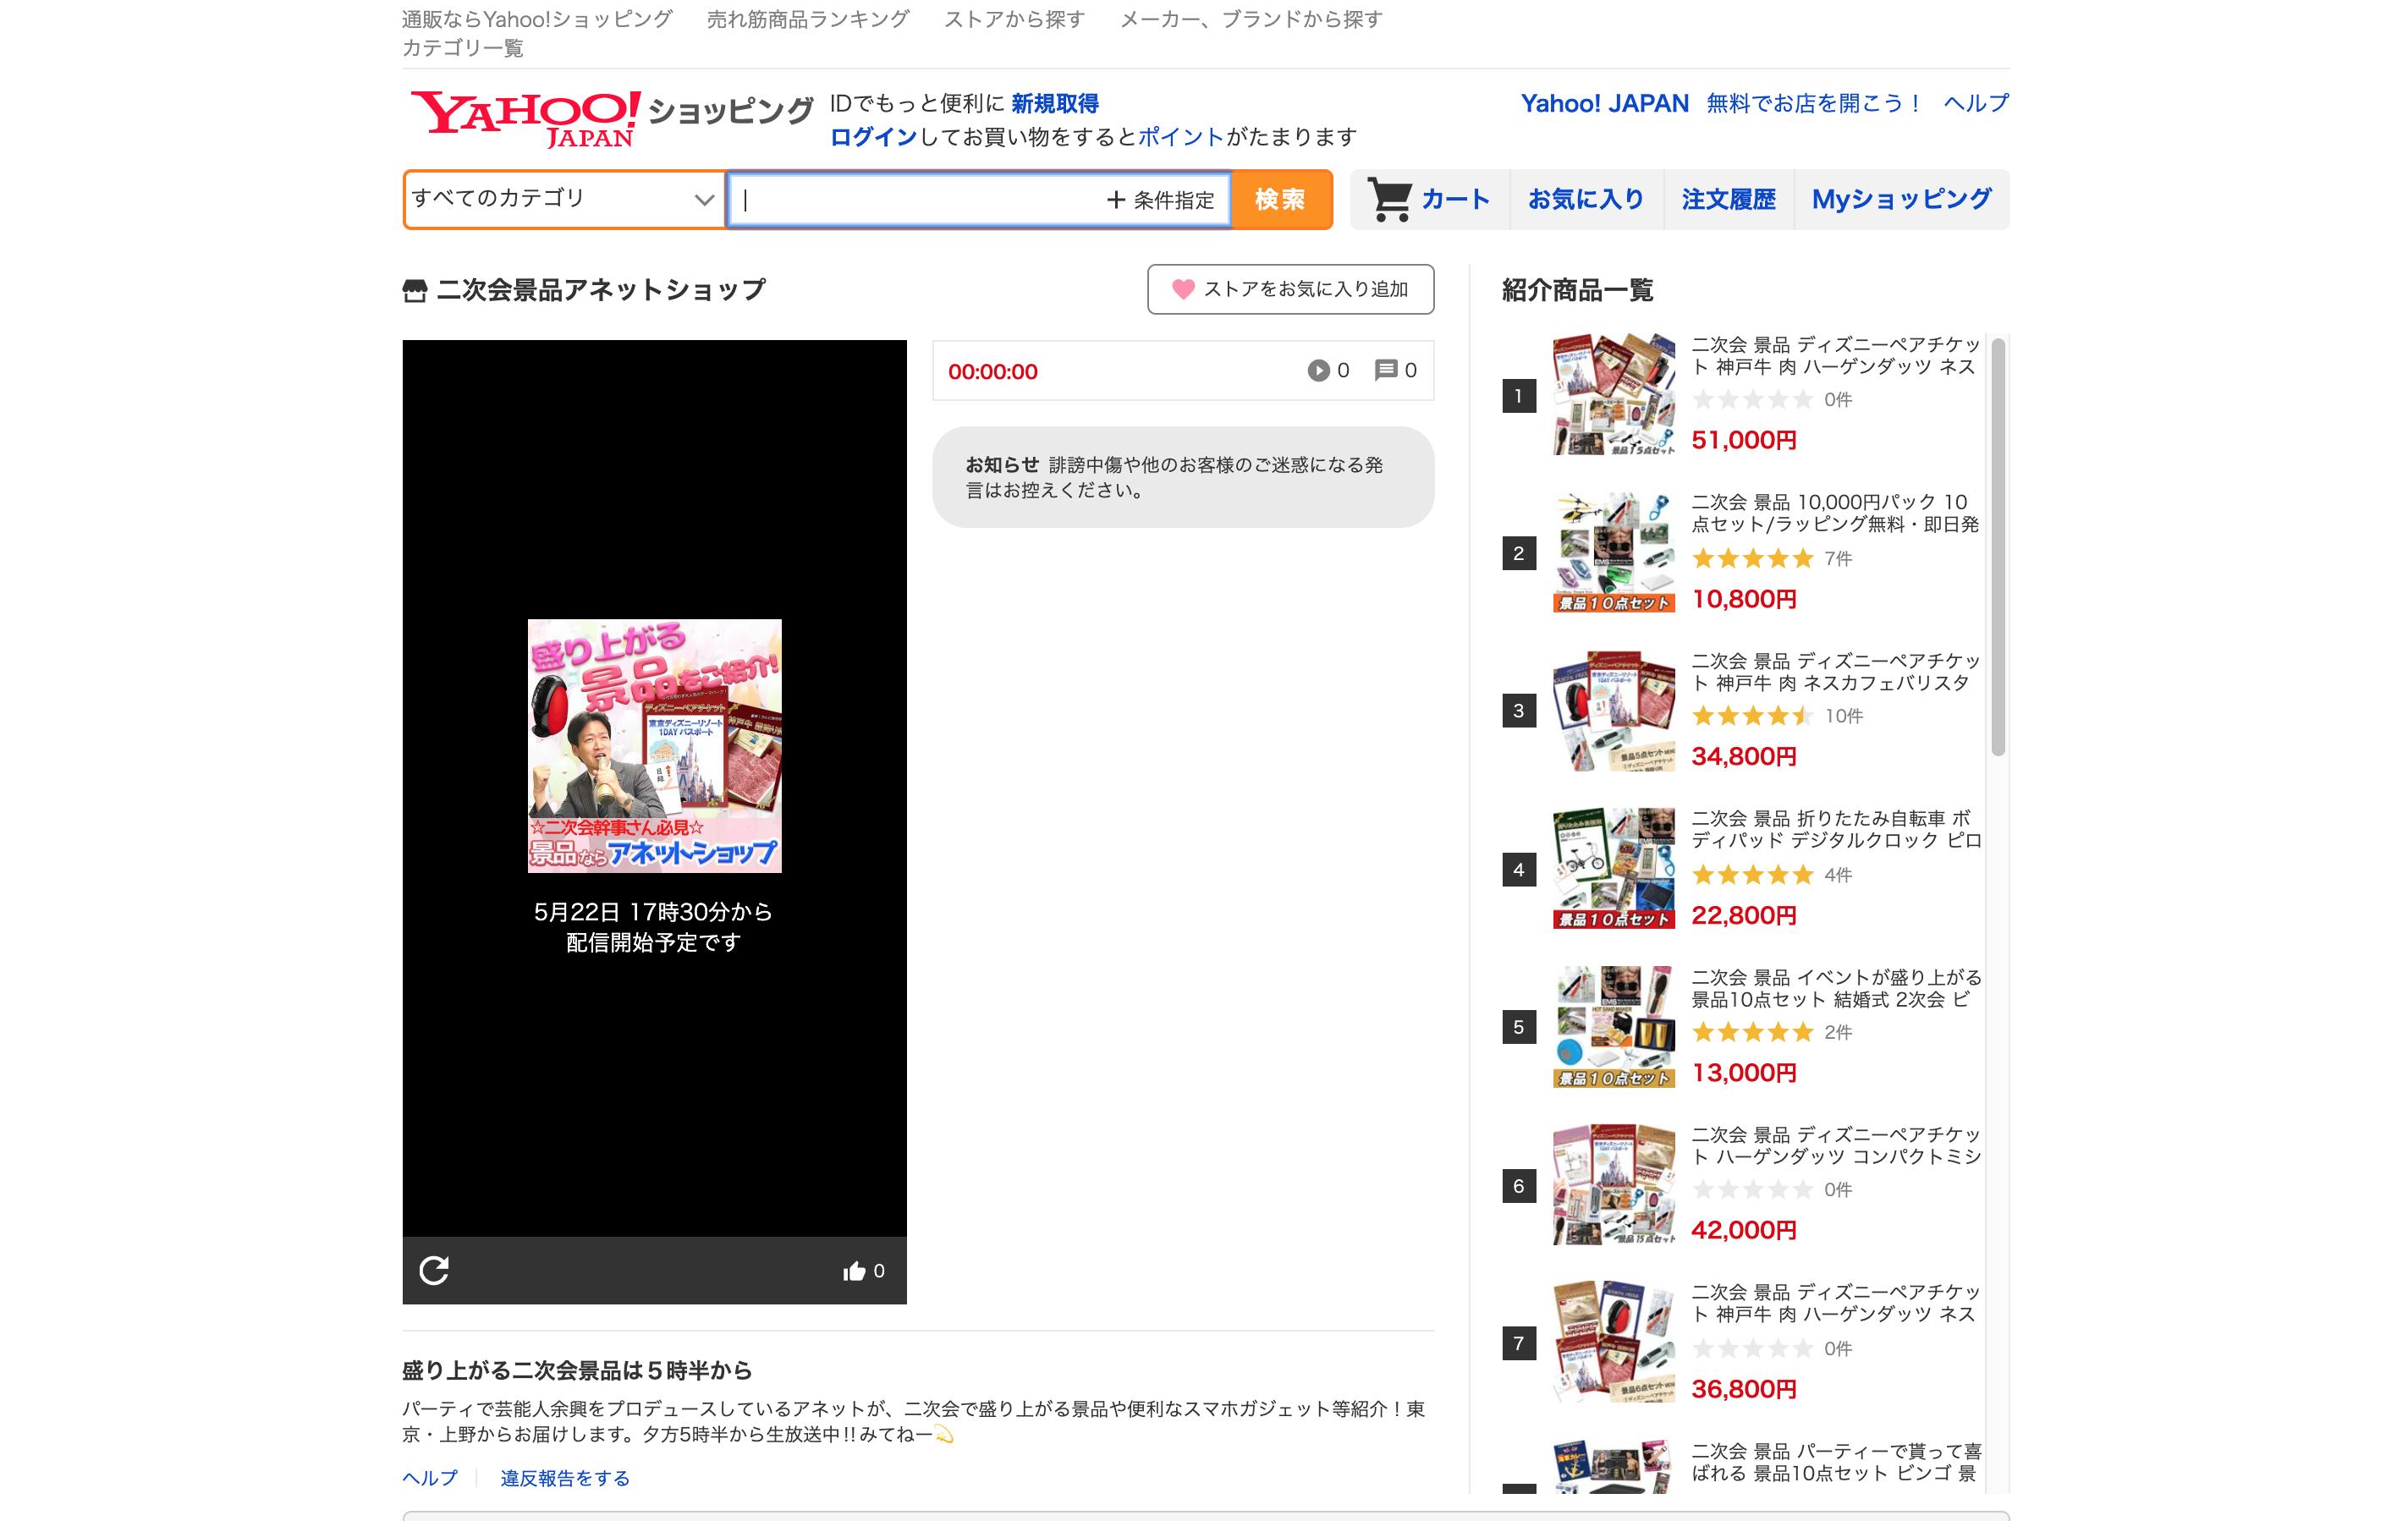 Yahooライブコマース